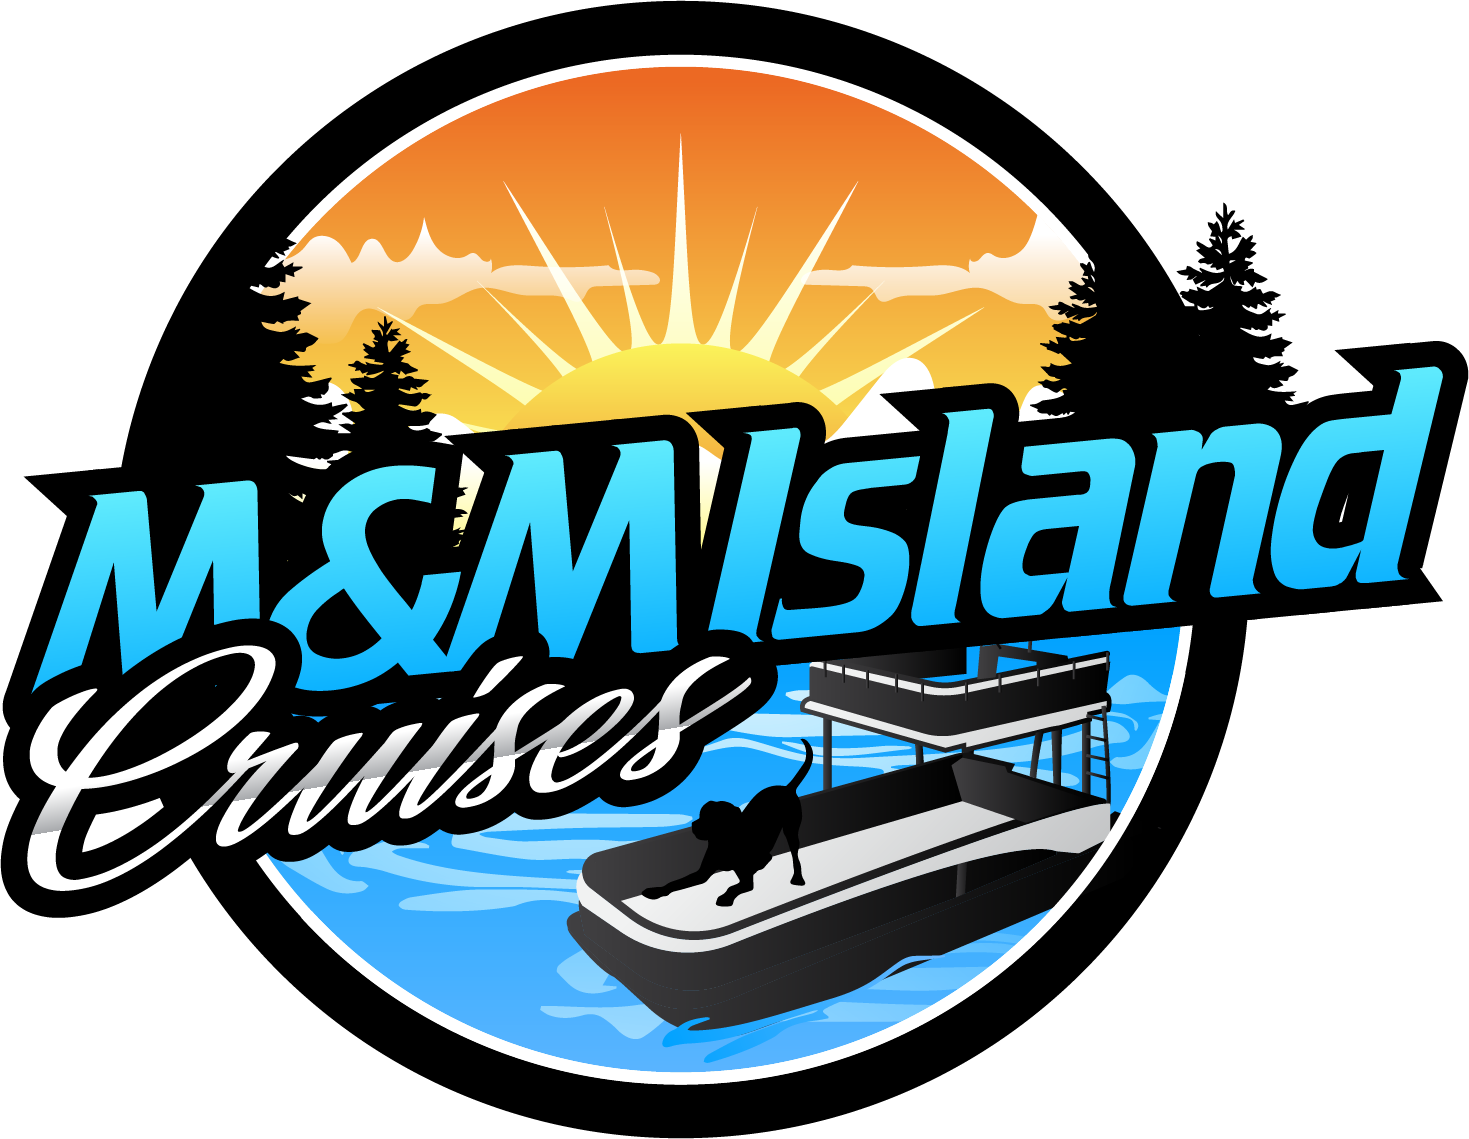 M&M Island Cruises